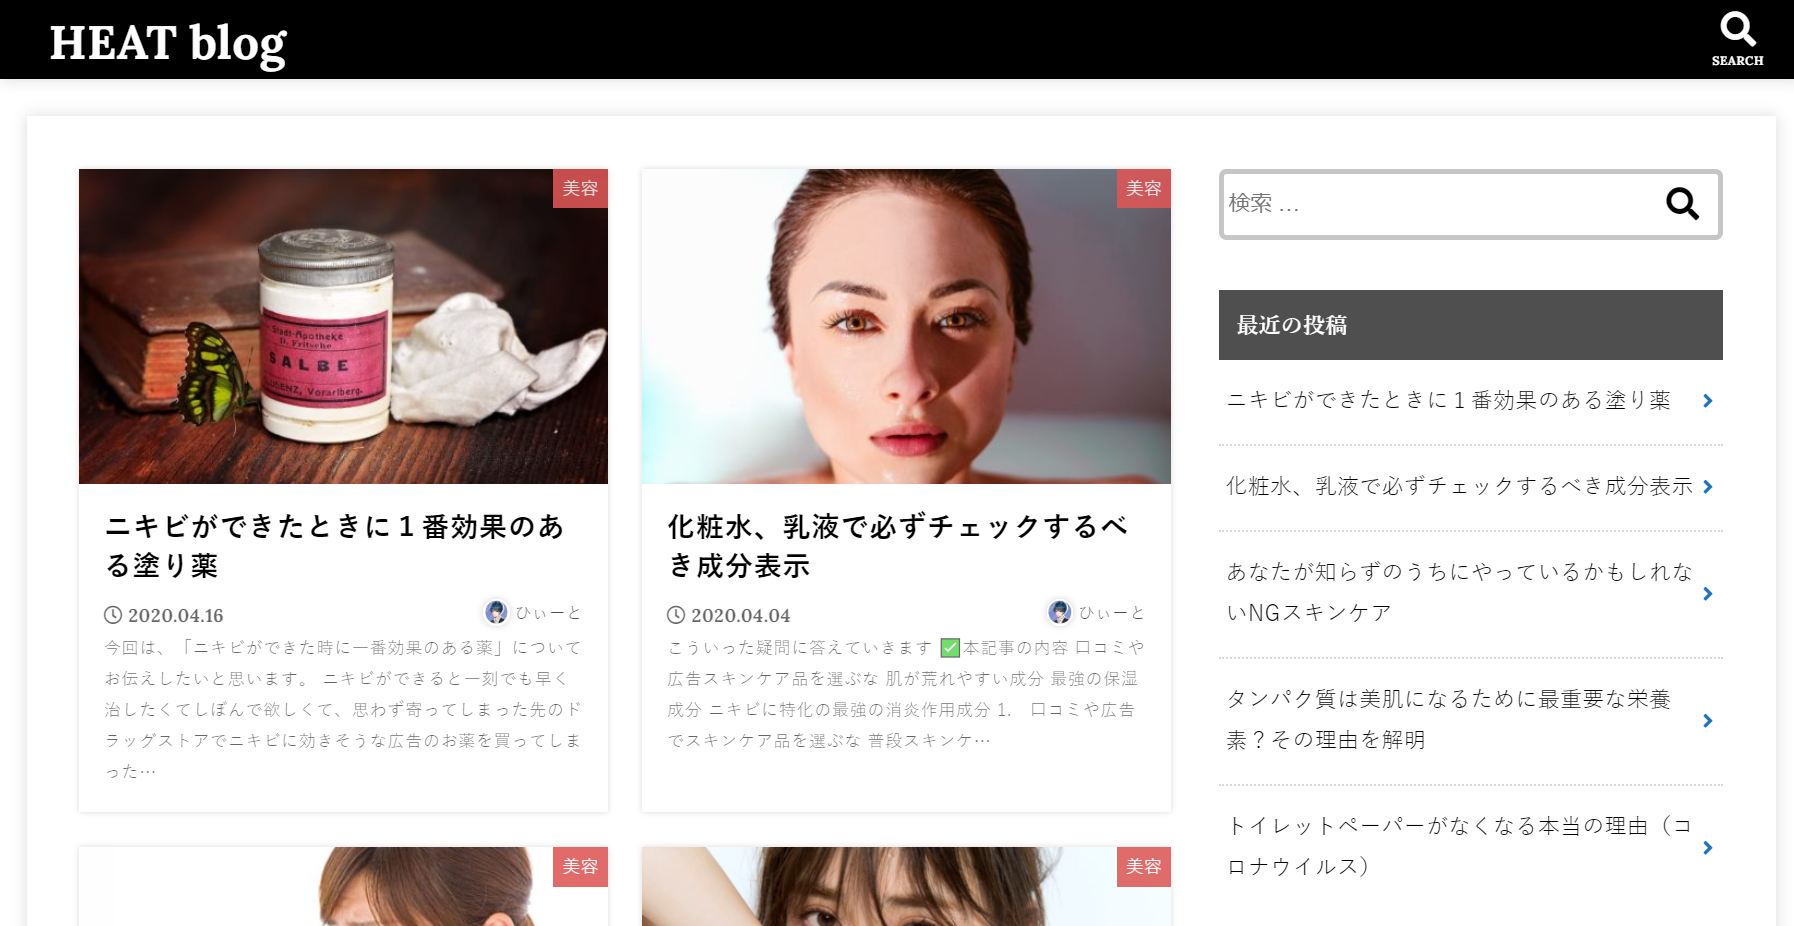 HEAT blog